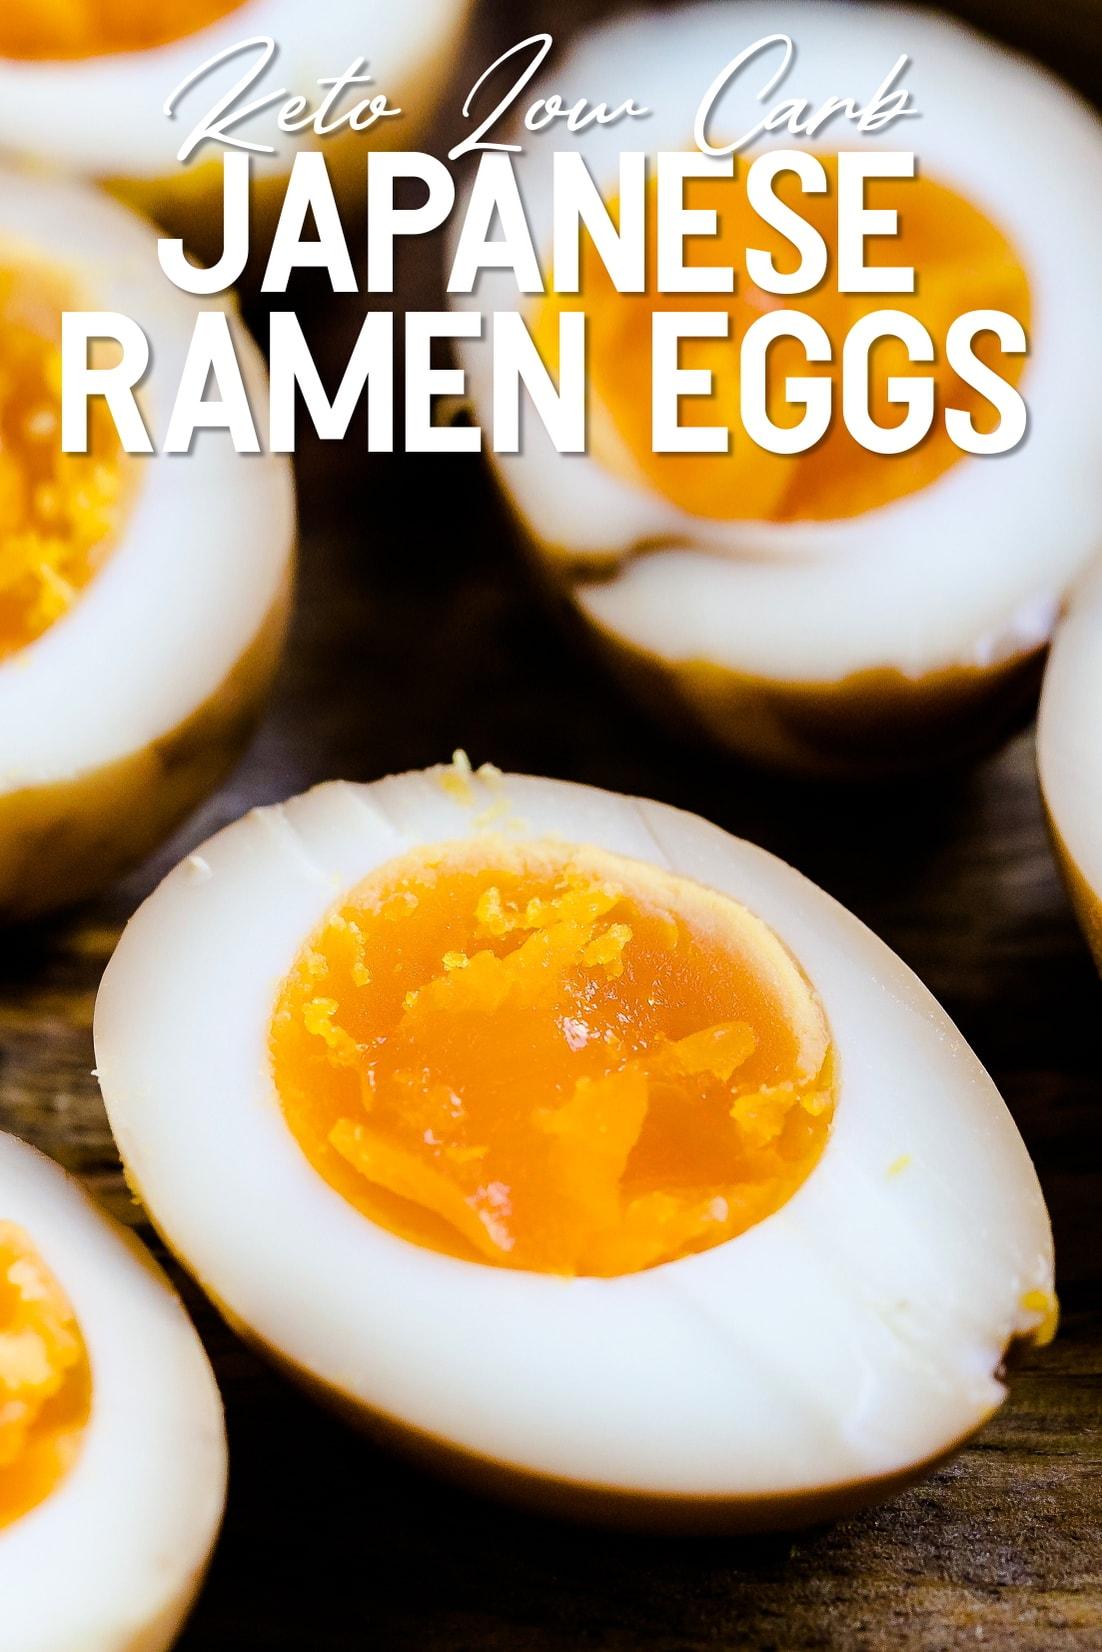 Japanese Keto Ramen Eggs cut in half served on wooden plank